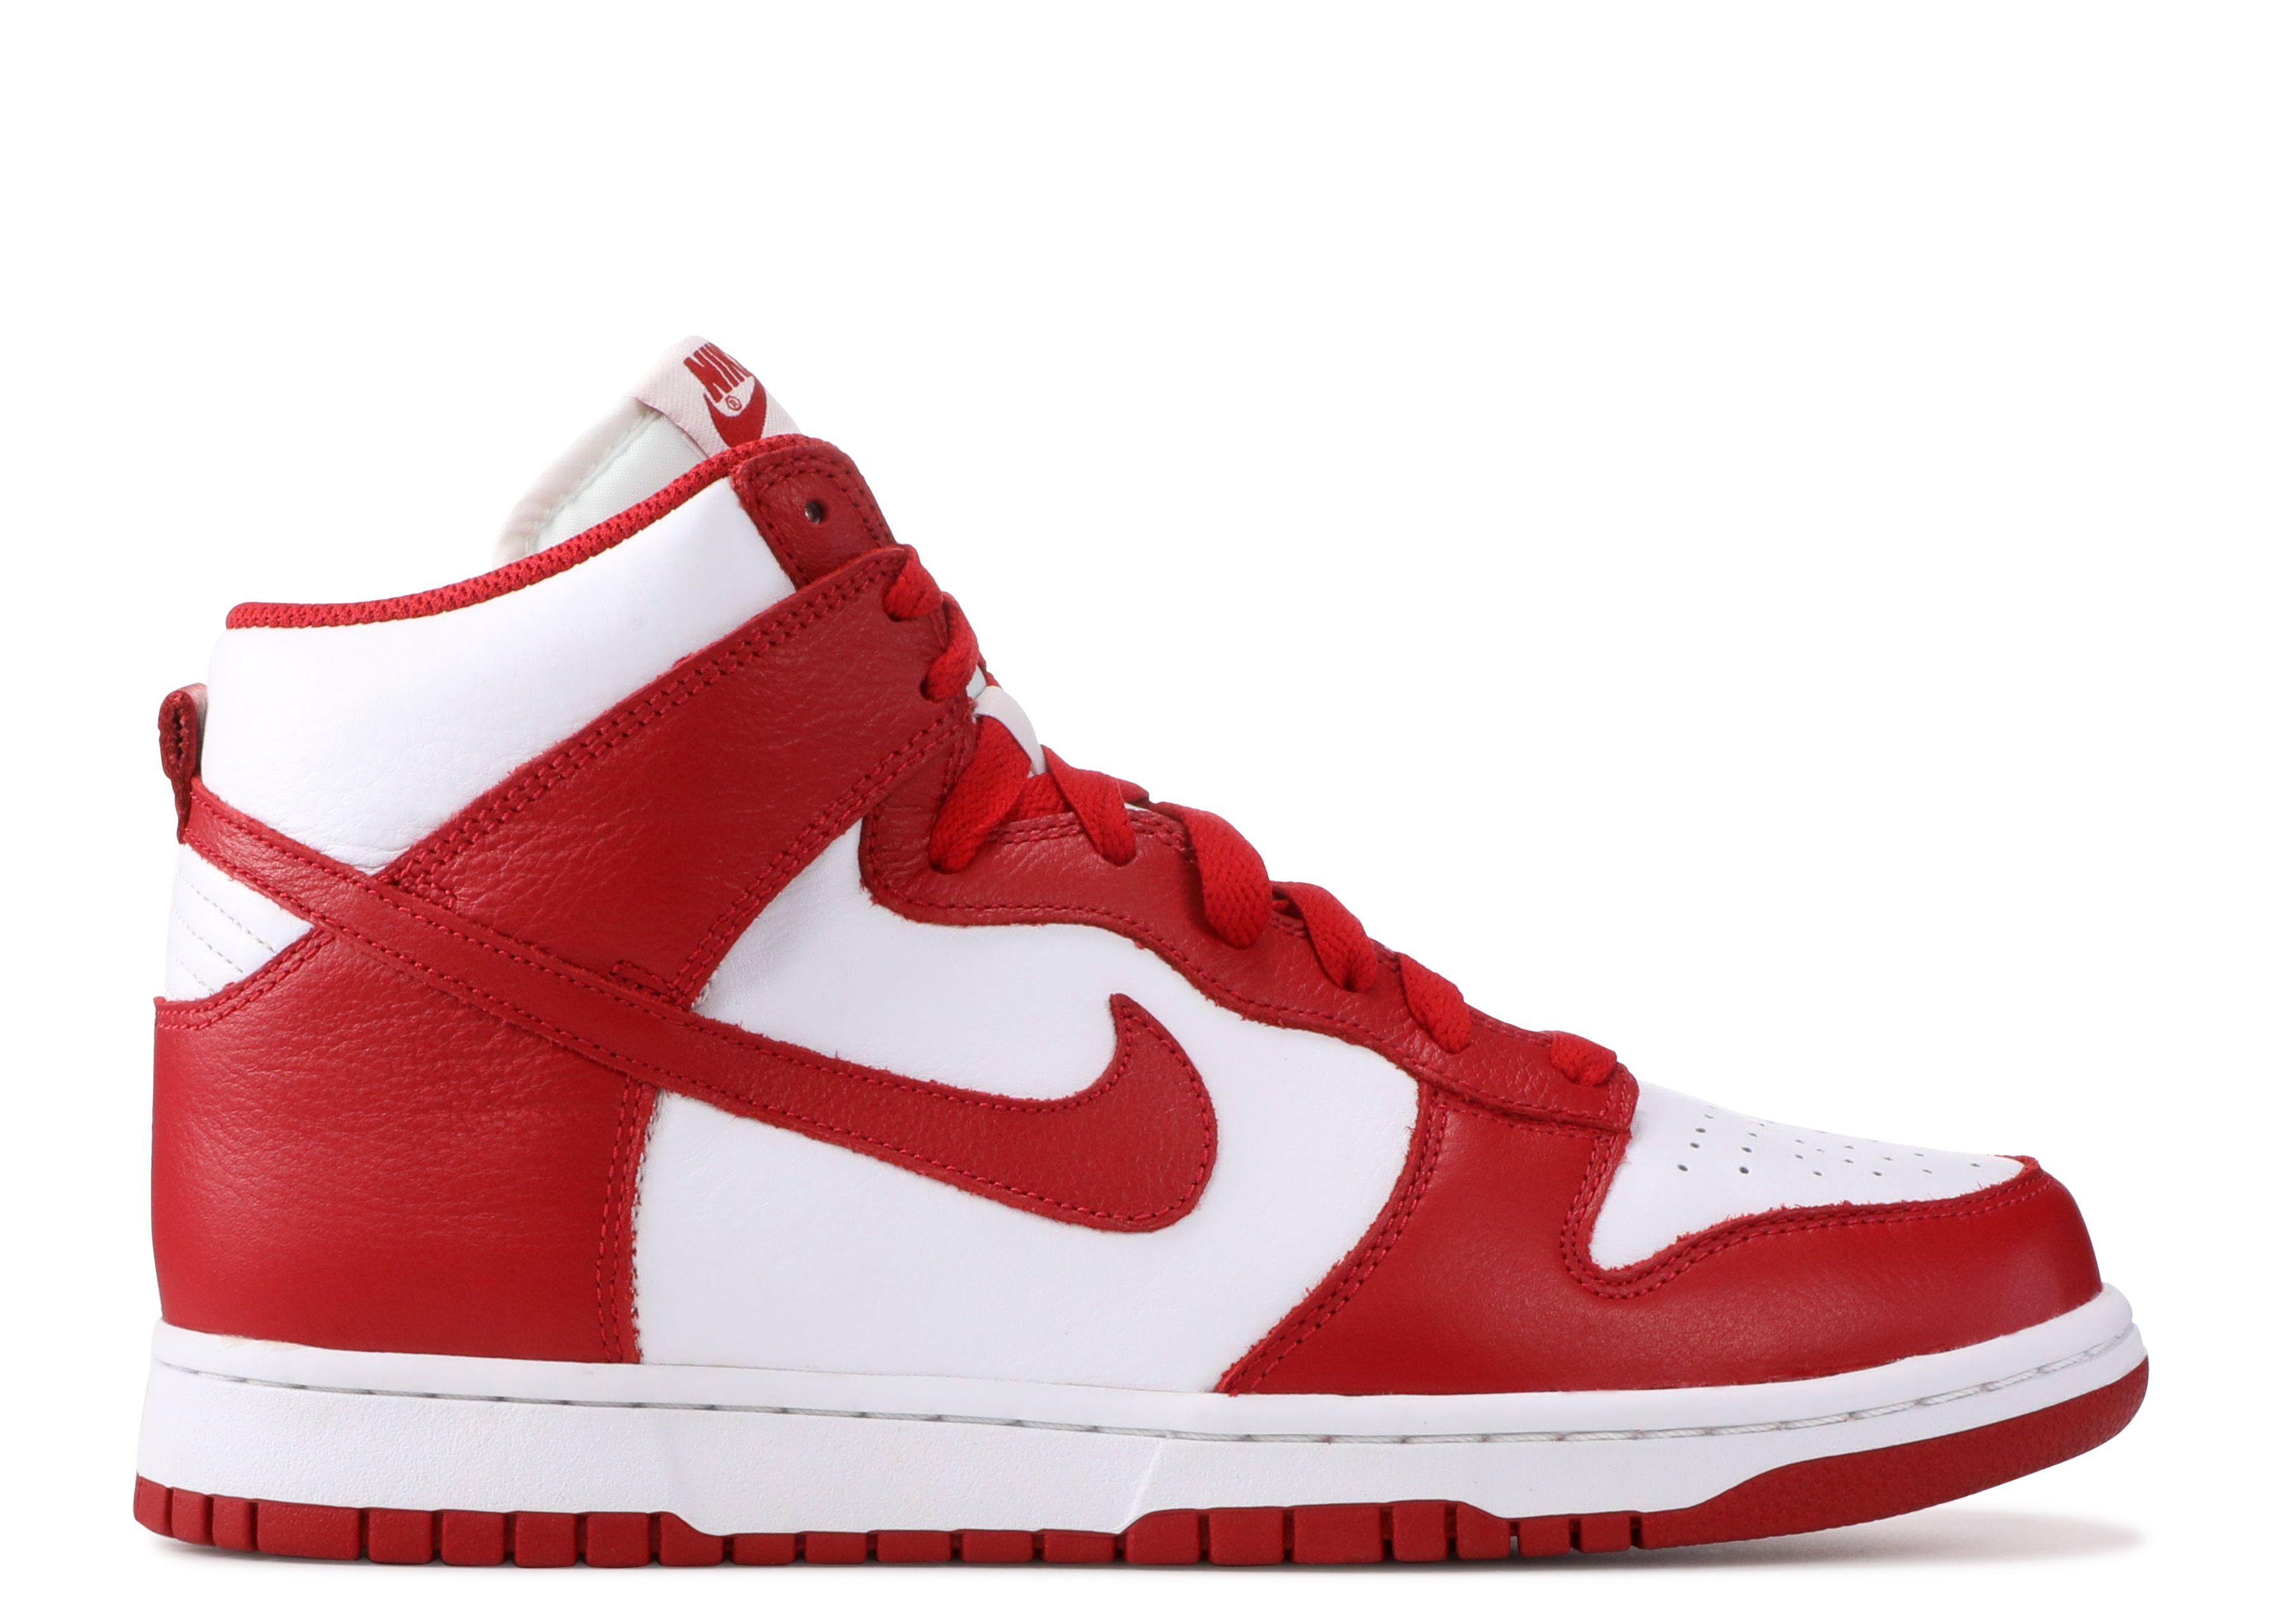 Dunk Retro Qs Be True St John S Sneaker Collection Nike Dunks Nike